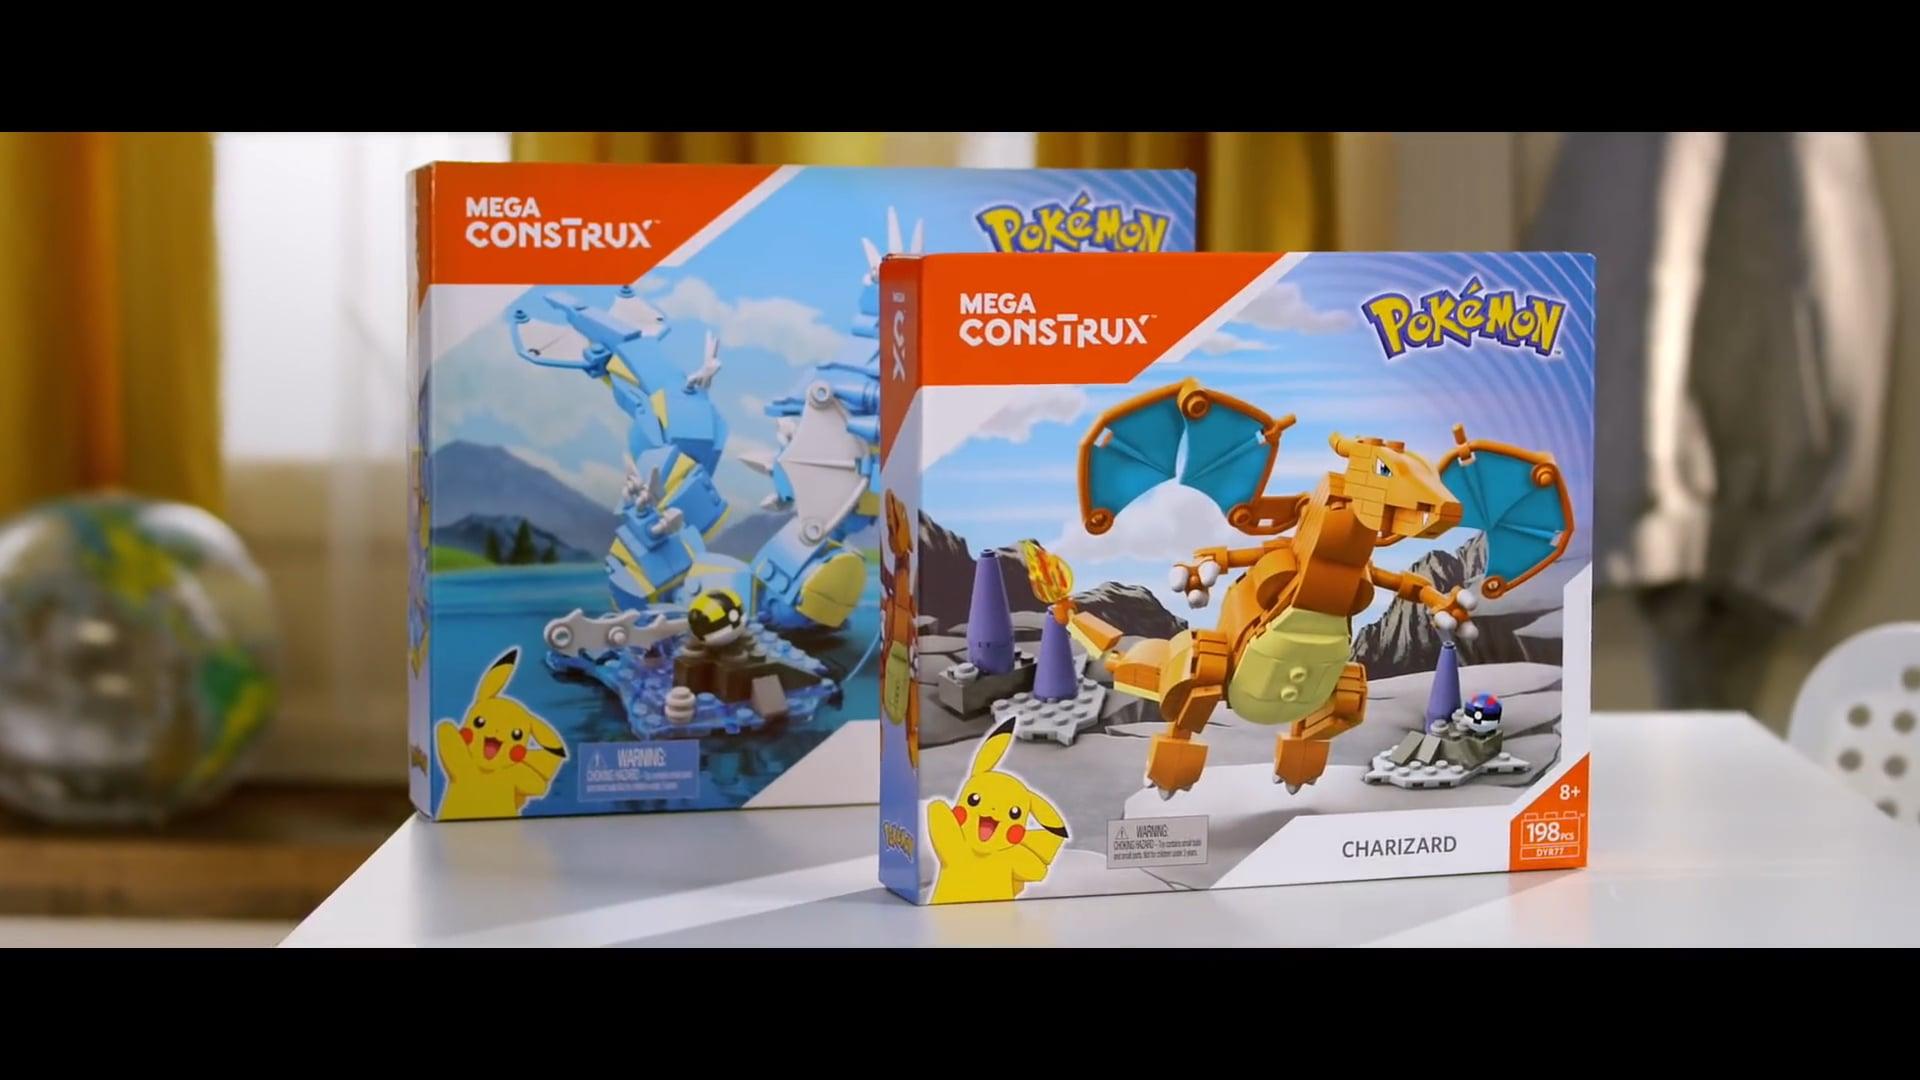 Pokémon Mega Construx Commercial